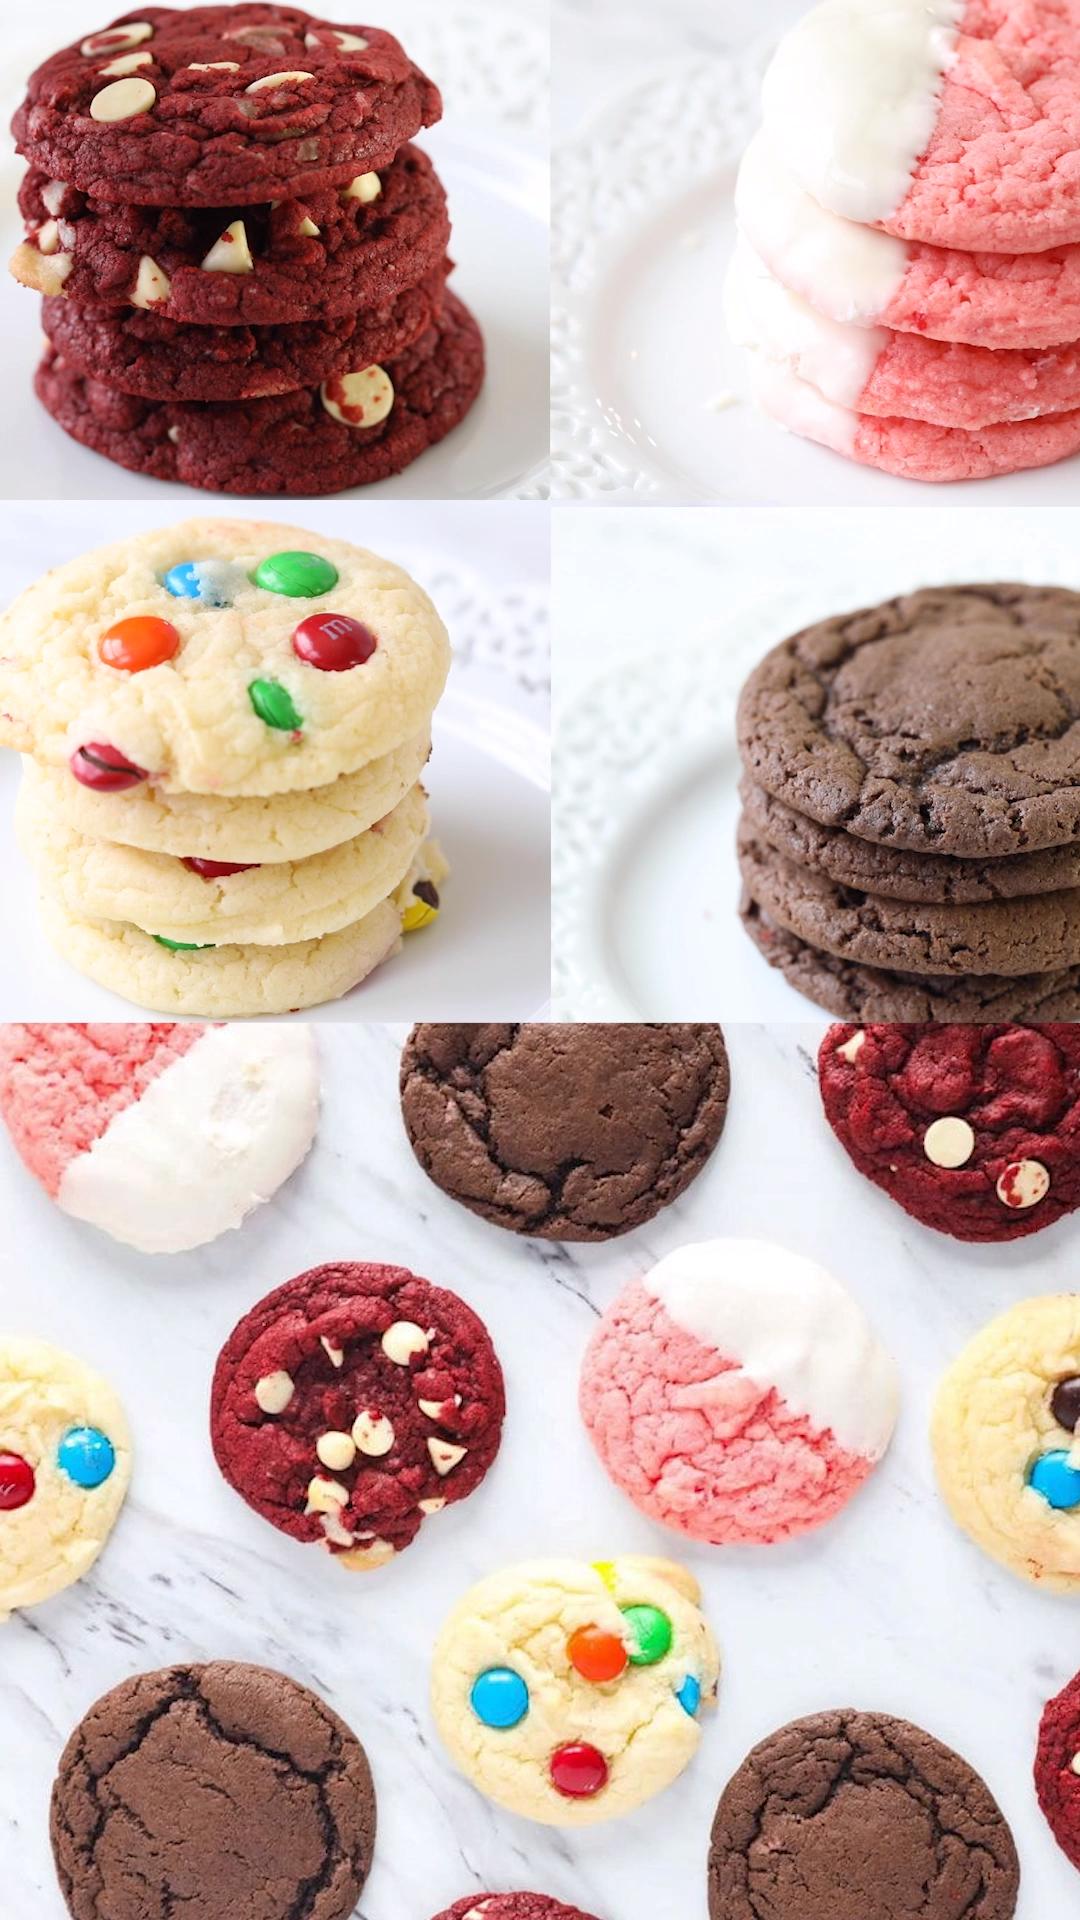 Cake Mix Cookies (3 ingredients!)